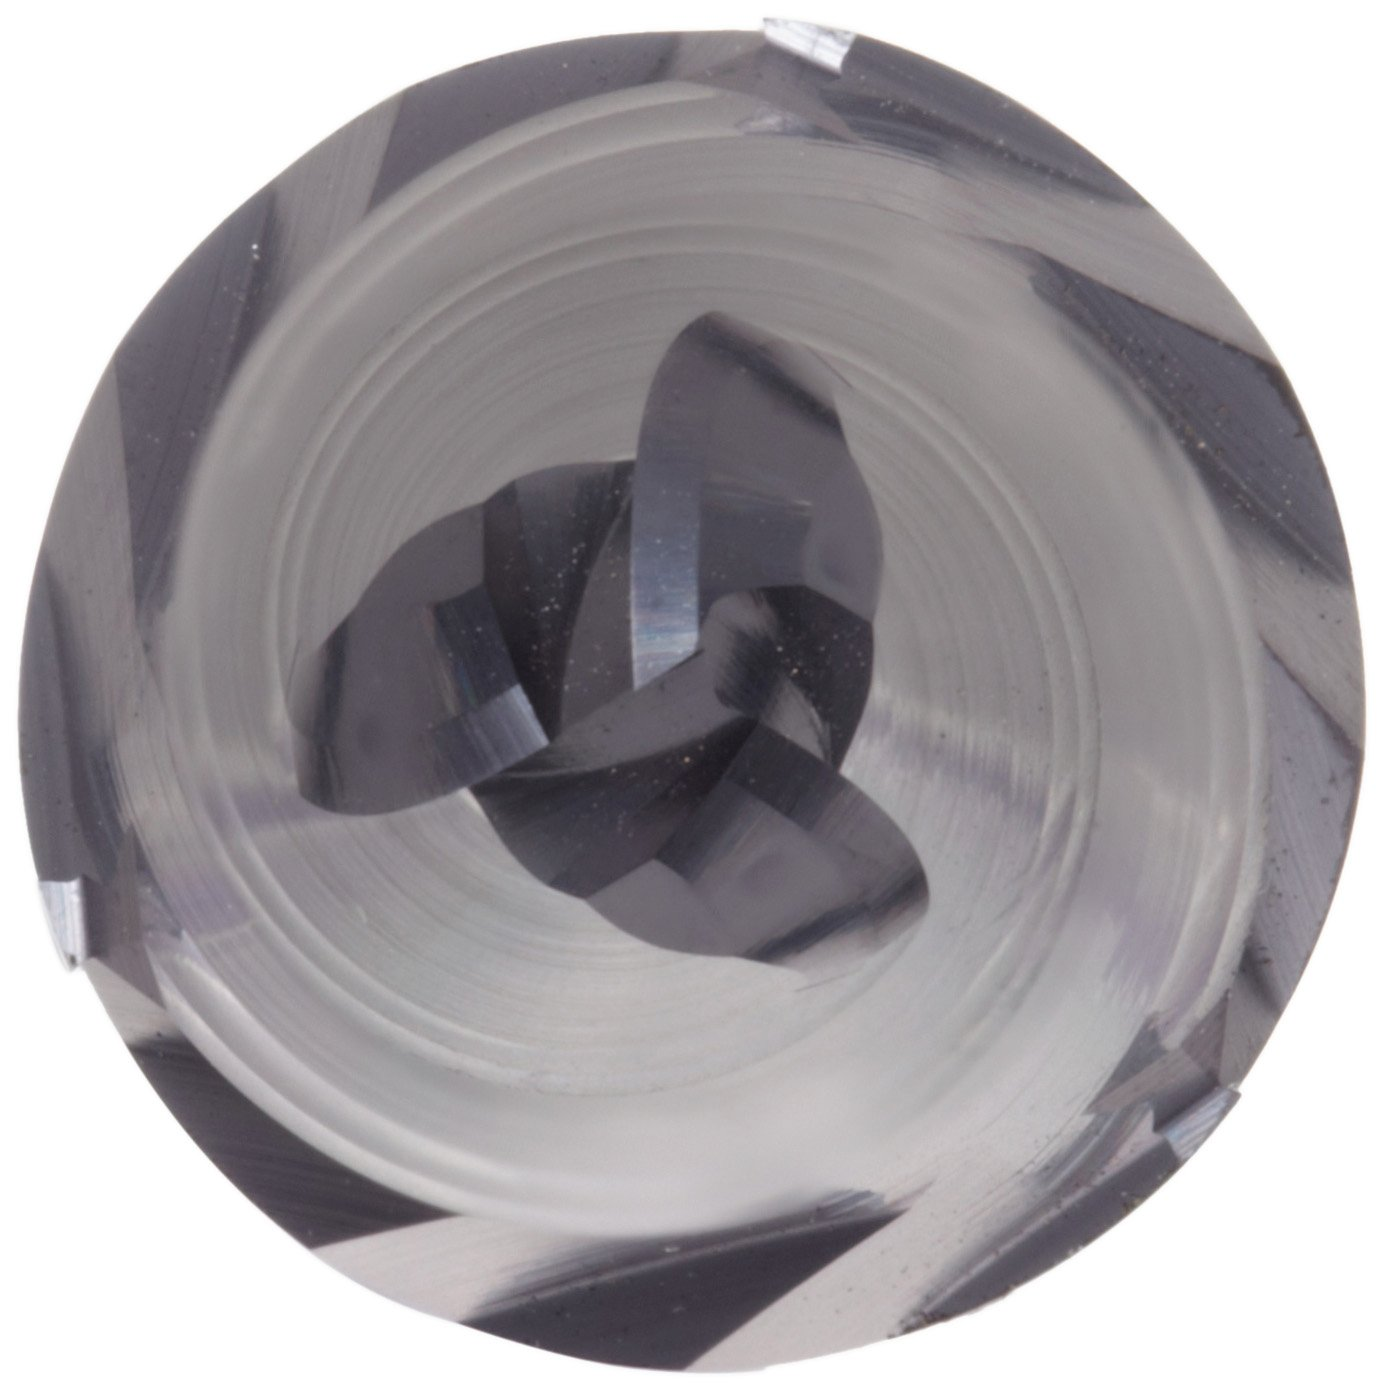 3 Overall Length YG-1 E5078 Carbide Ball Nose End Mill TIALN Multilayer Finish 0.25 Cutting Diameter 30 Deg Helix 0.25 Shank Diameter 3 Flutes